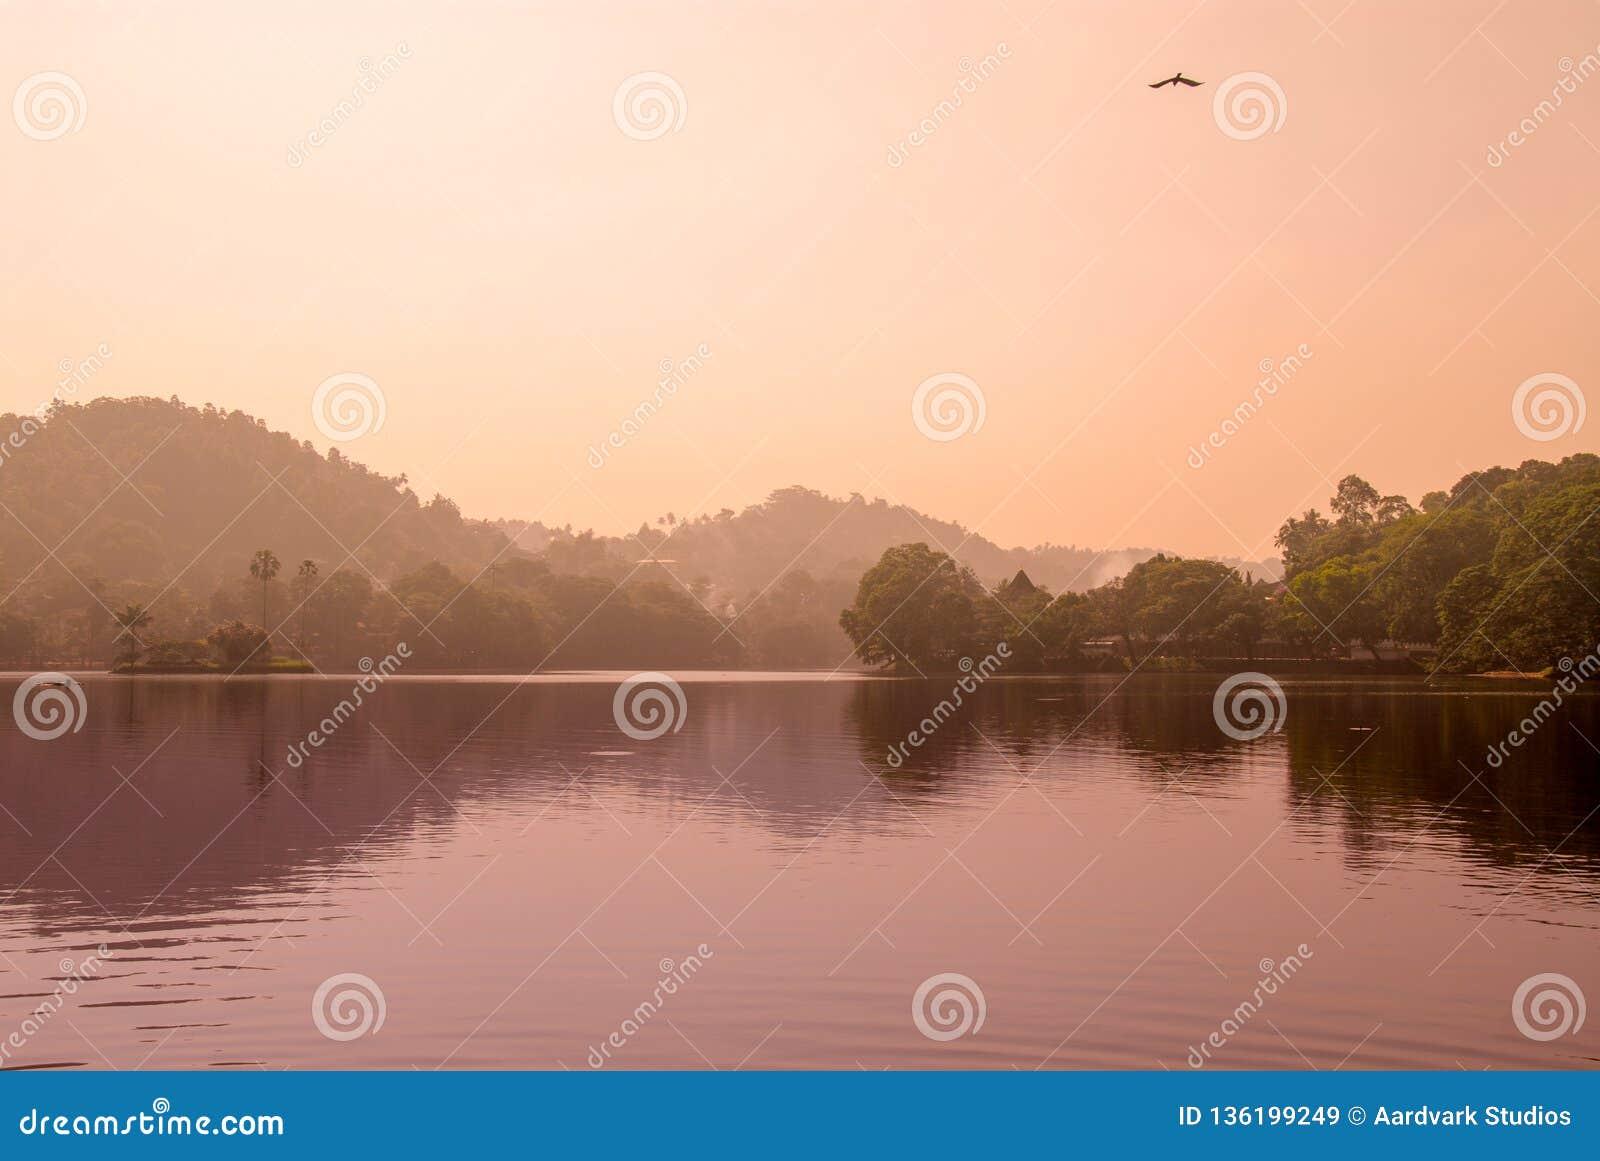 Sri Lanka kandy tempelsjö